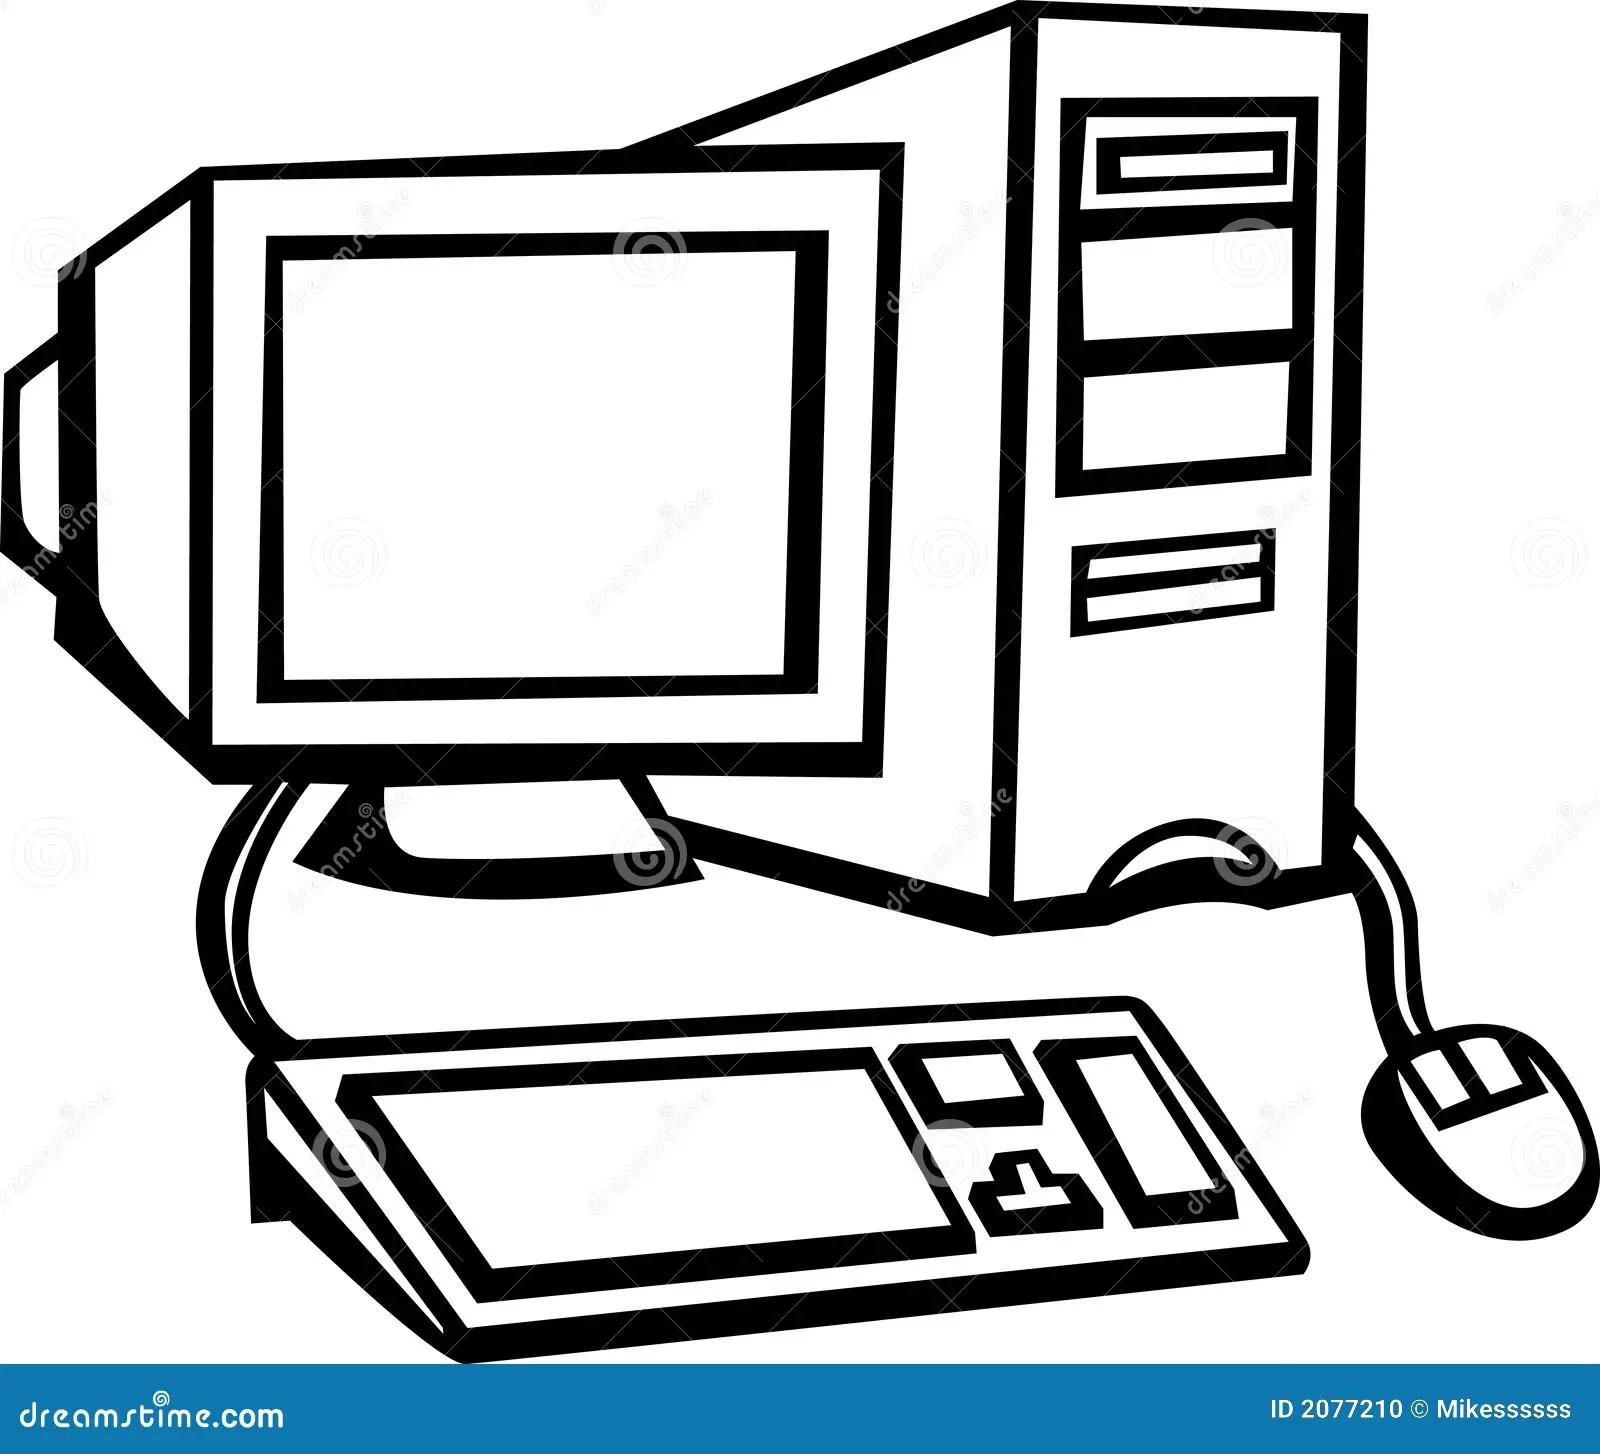 Desktop Computer Vector Illustration Stock Vector